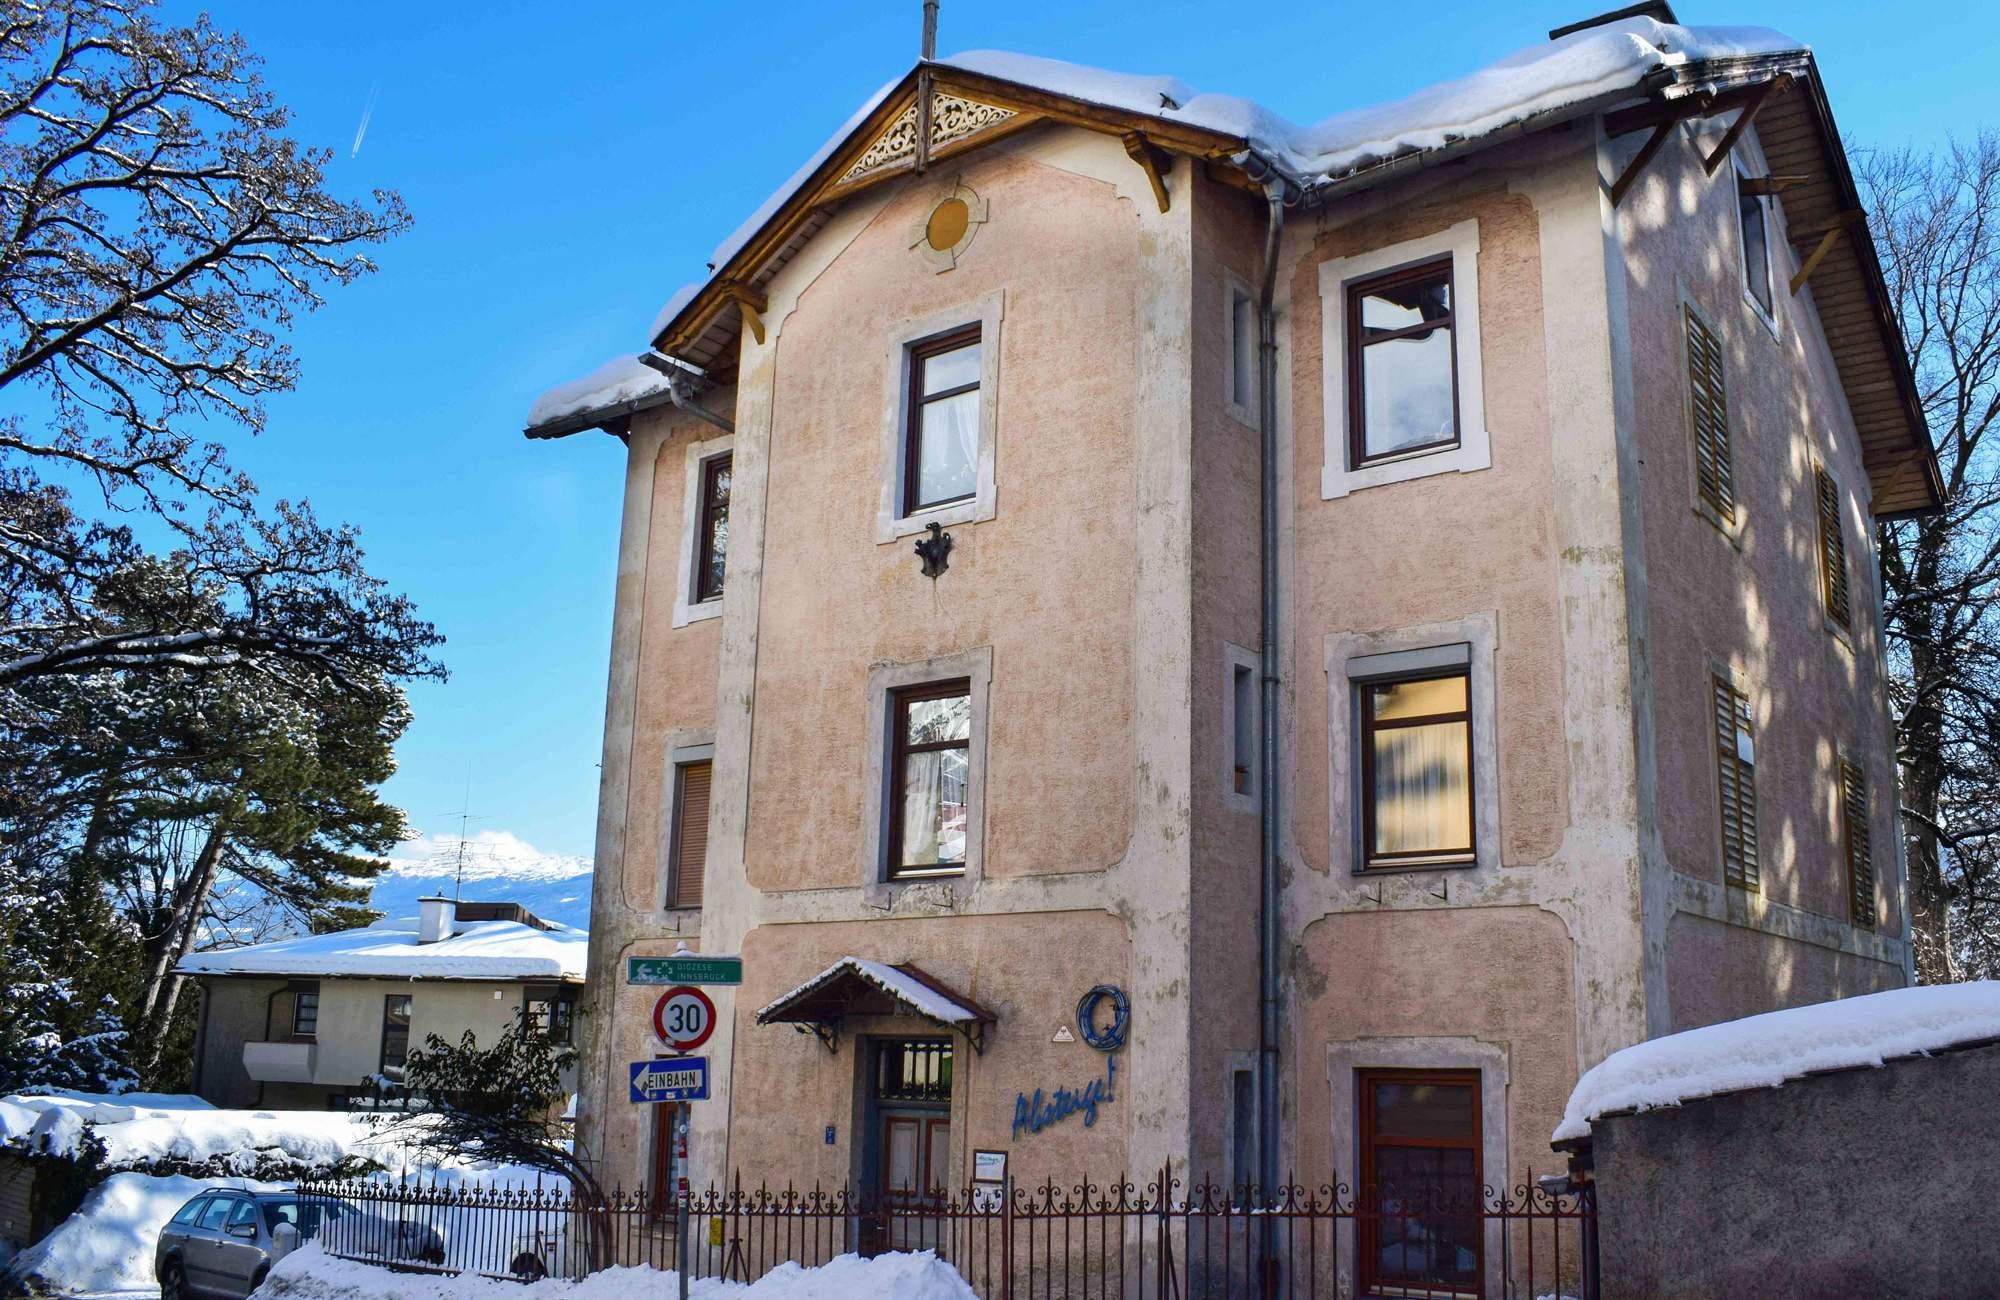 Villa_Absteige_Innsbruck_Room_Apartments_Holiday_Budget_Lon_Stay_Austria_Tirol_02_WEB2013